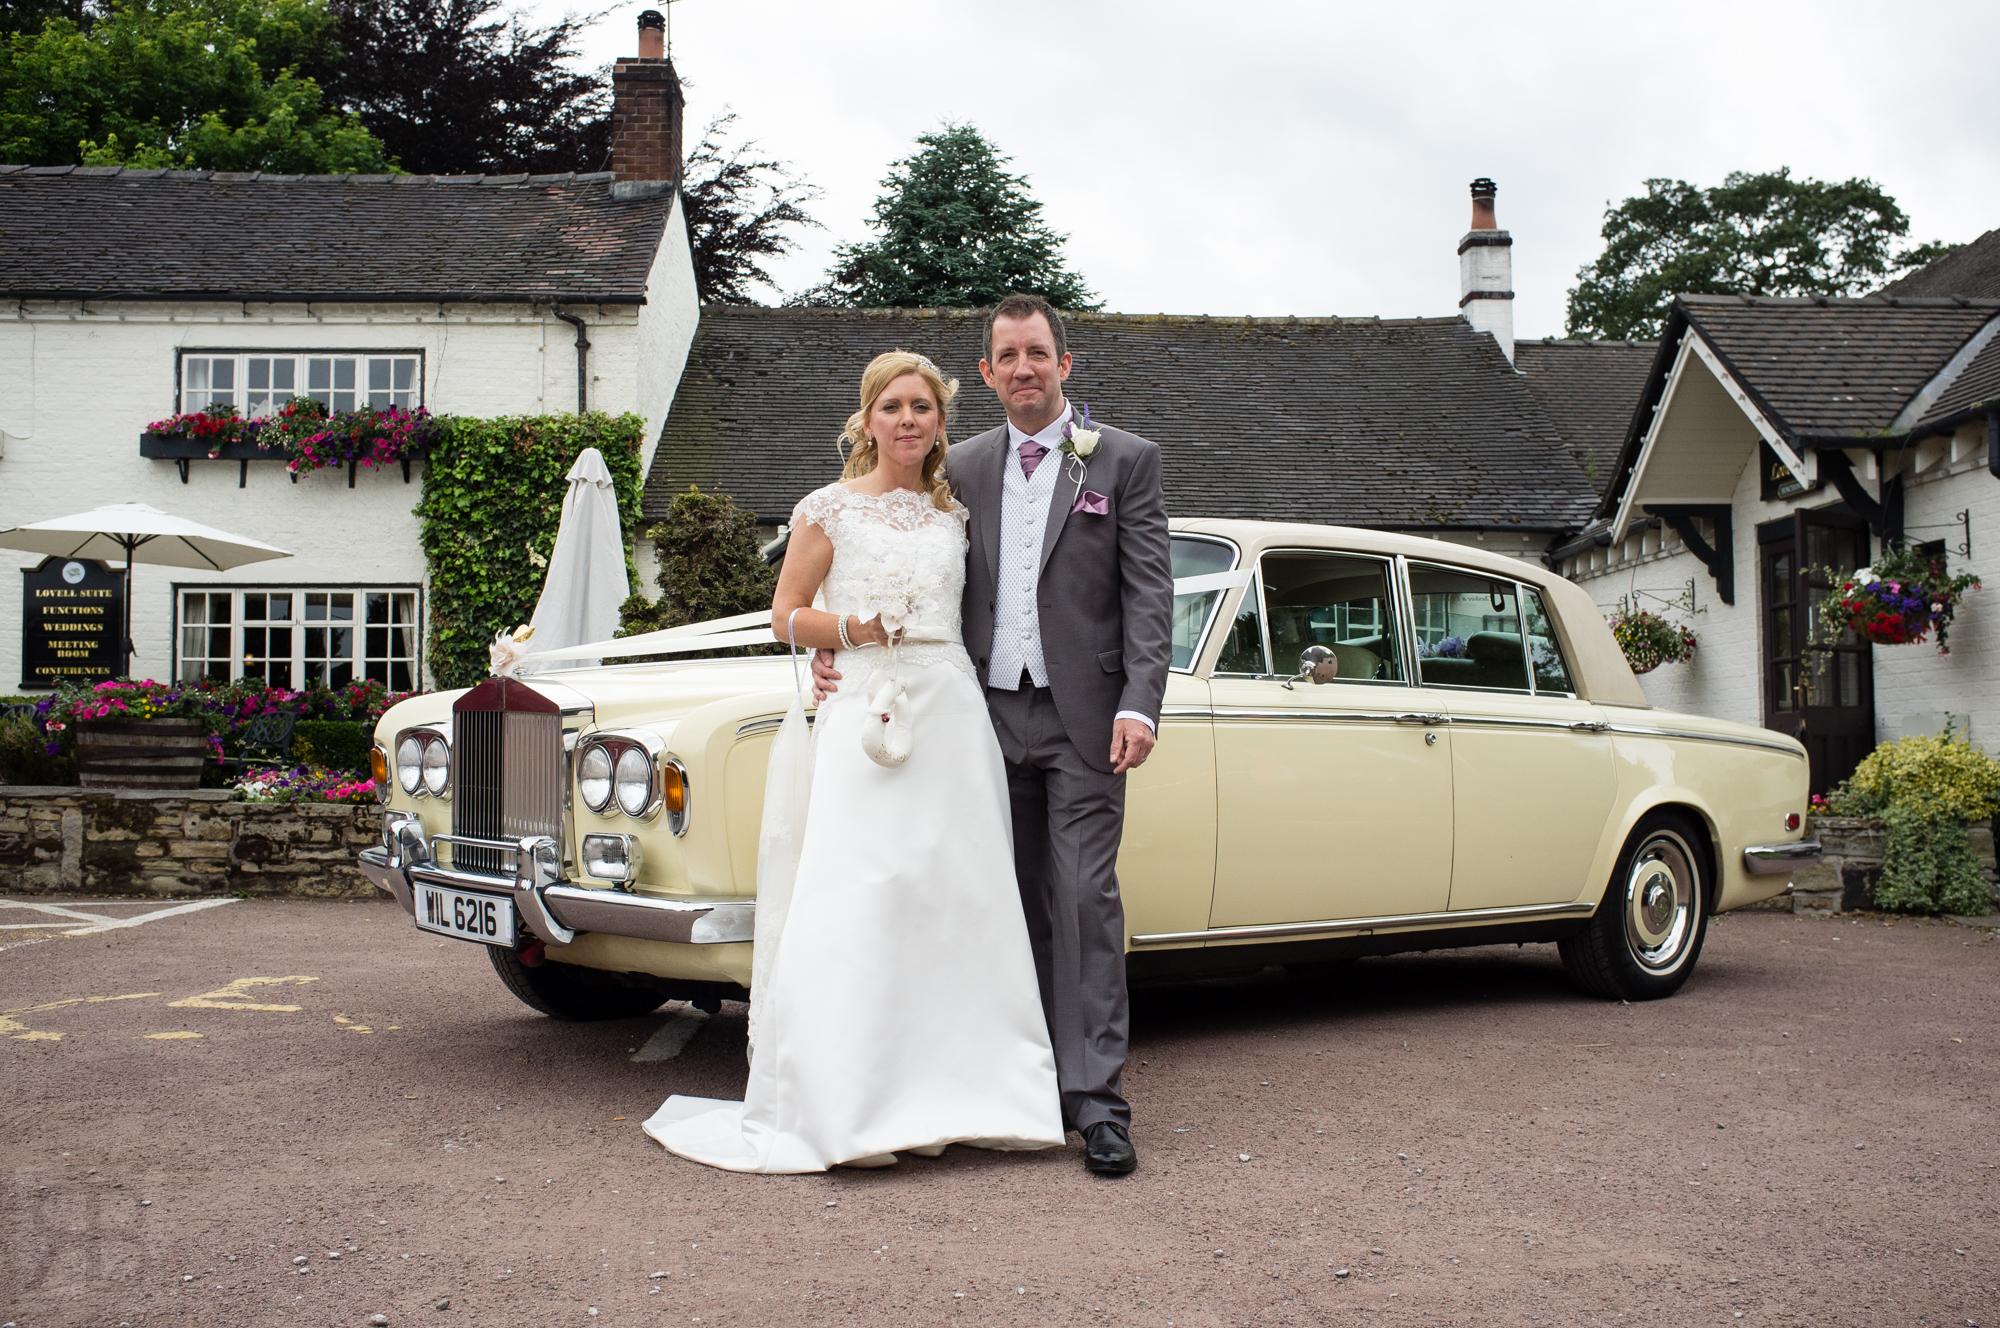 110715_LisaCraigJohnson_Wedding_1611688_WebWM.jpg